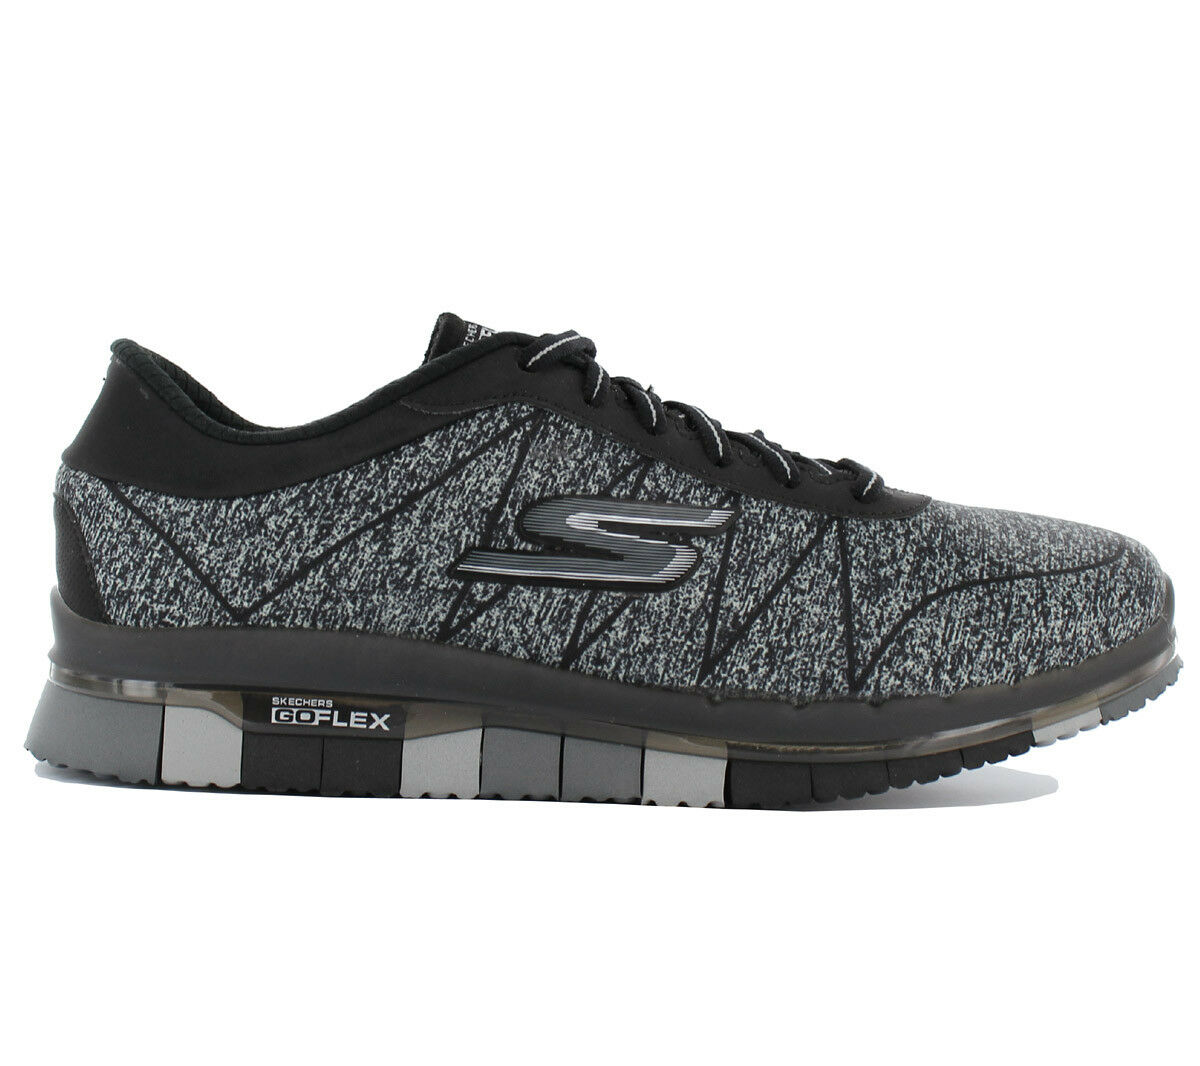 Skechers Go Flex Ability Ladies Sneaker Shoes Fitness Shoes Walk Black 14011